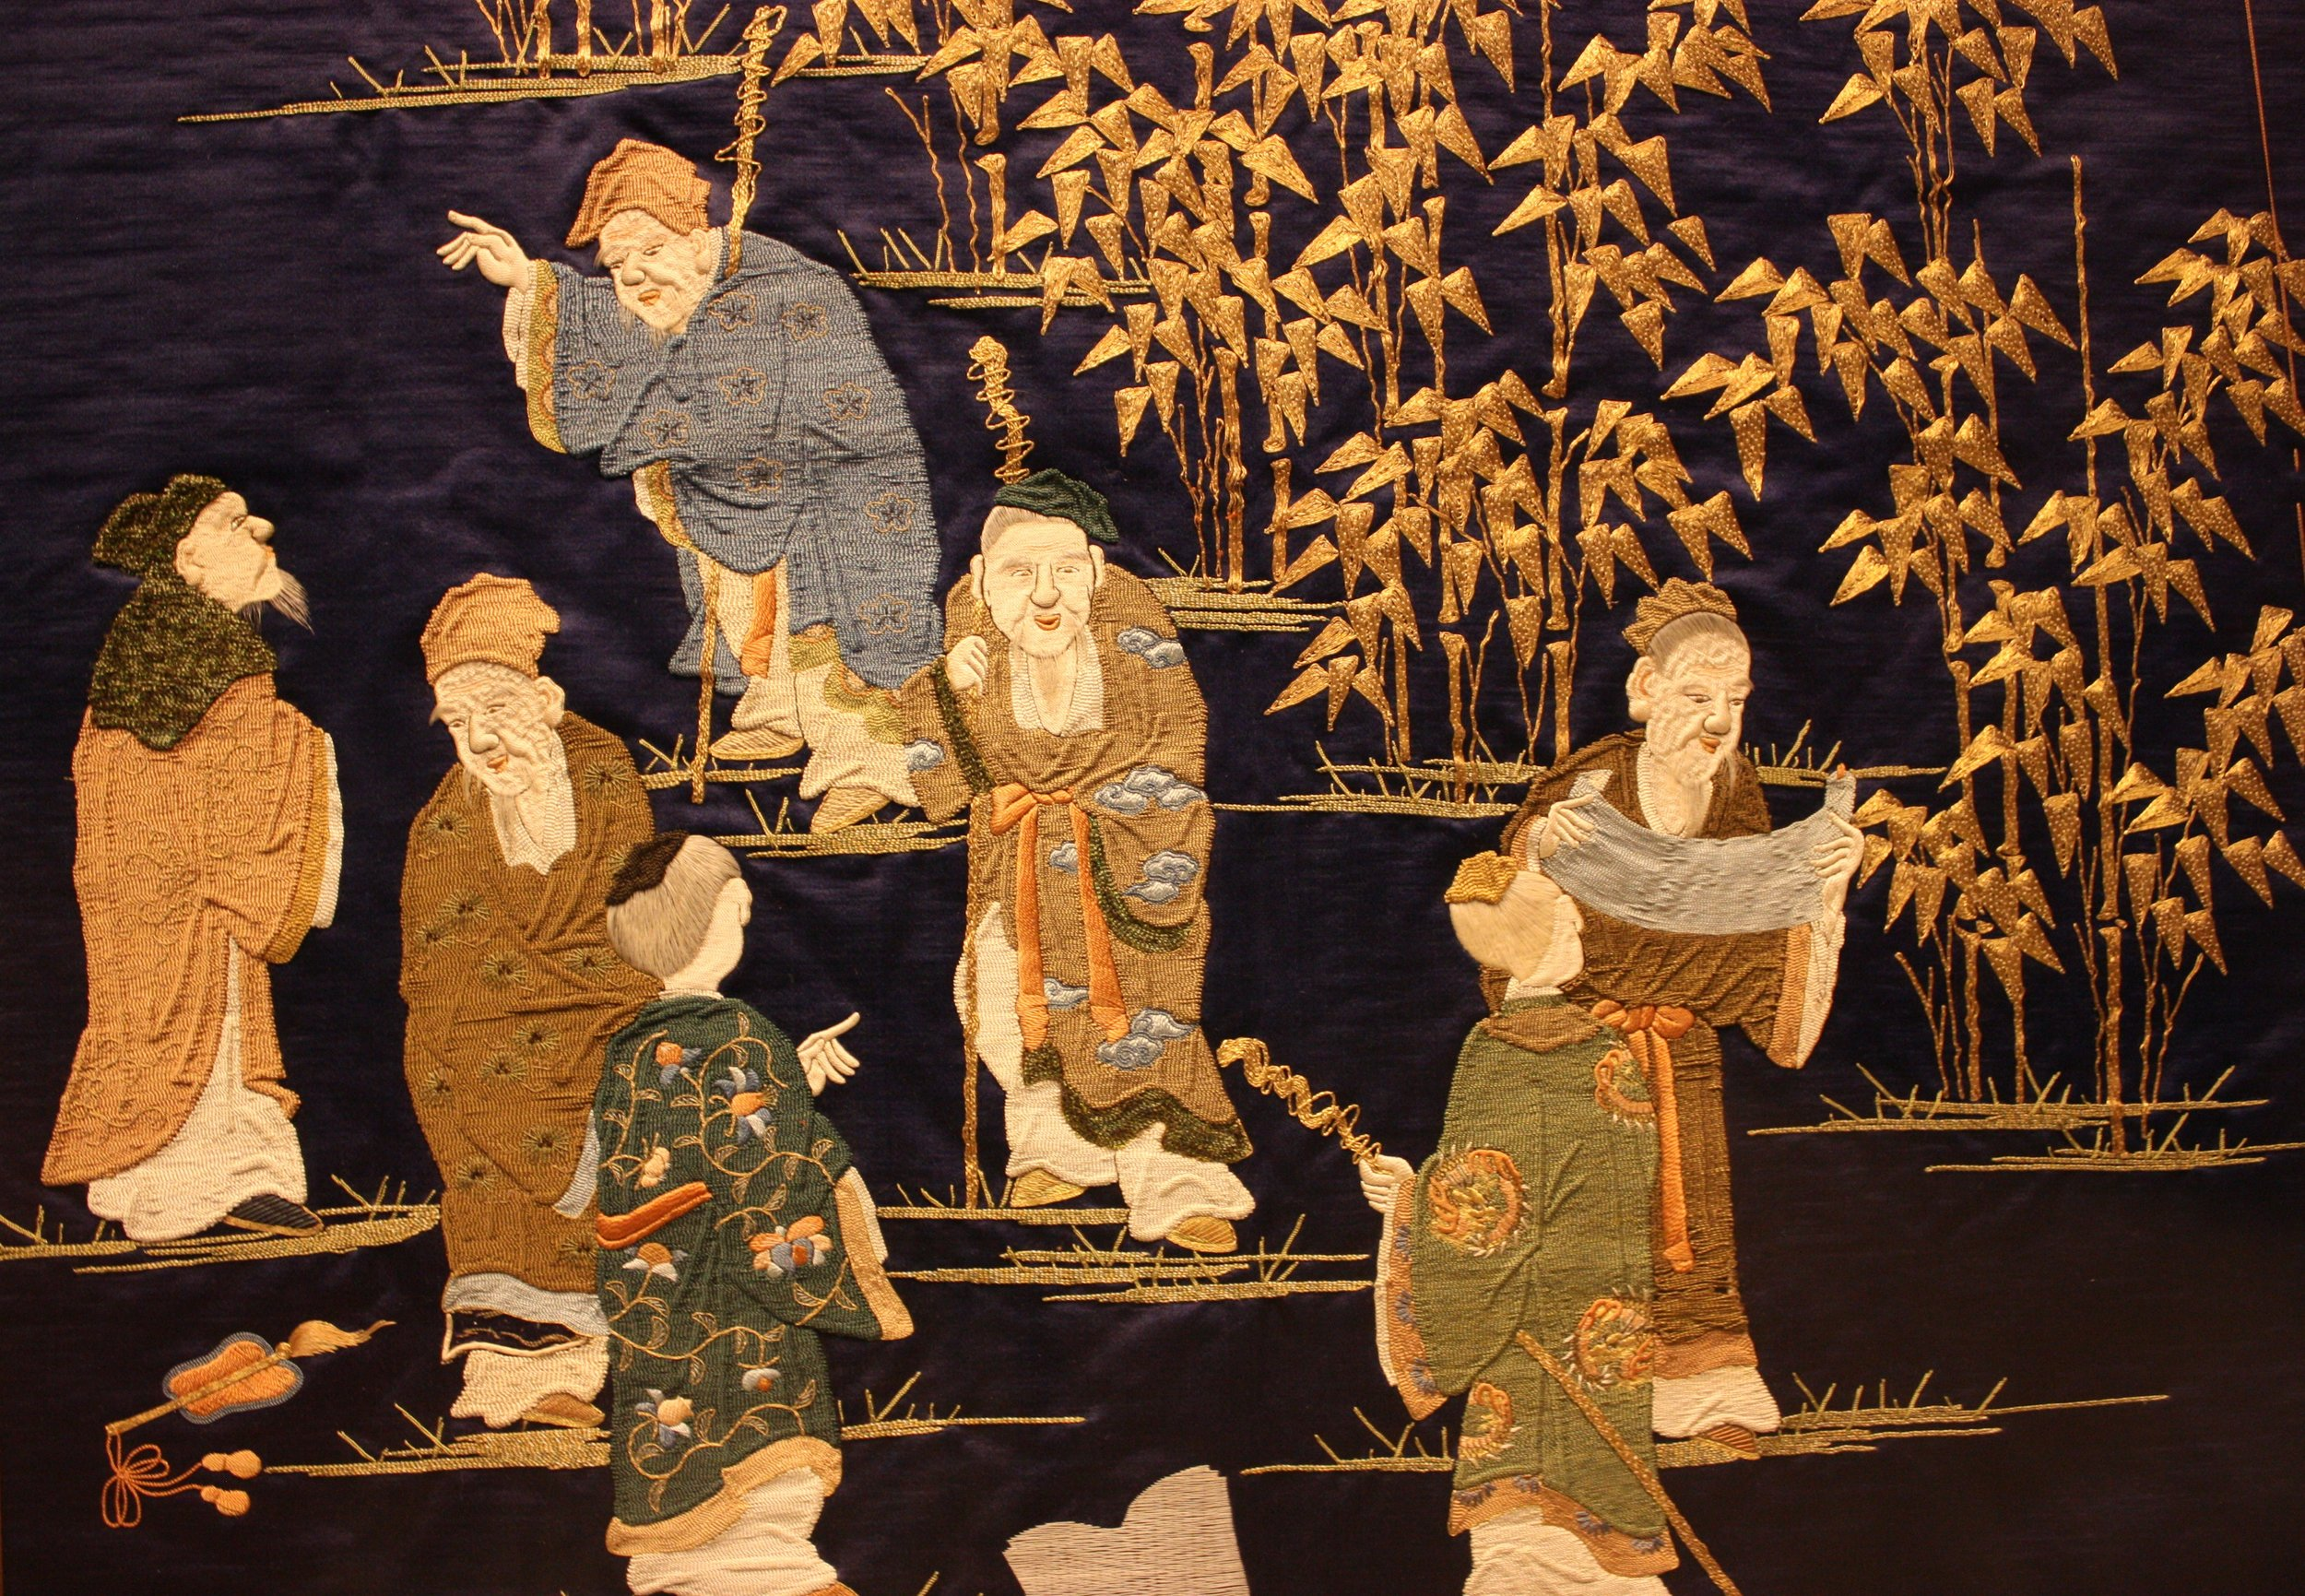 WLA_vanda_The_Seven_Sages_of_the_Bamboo_Grove.jpg